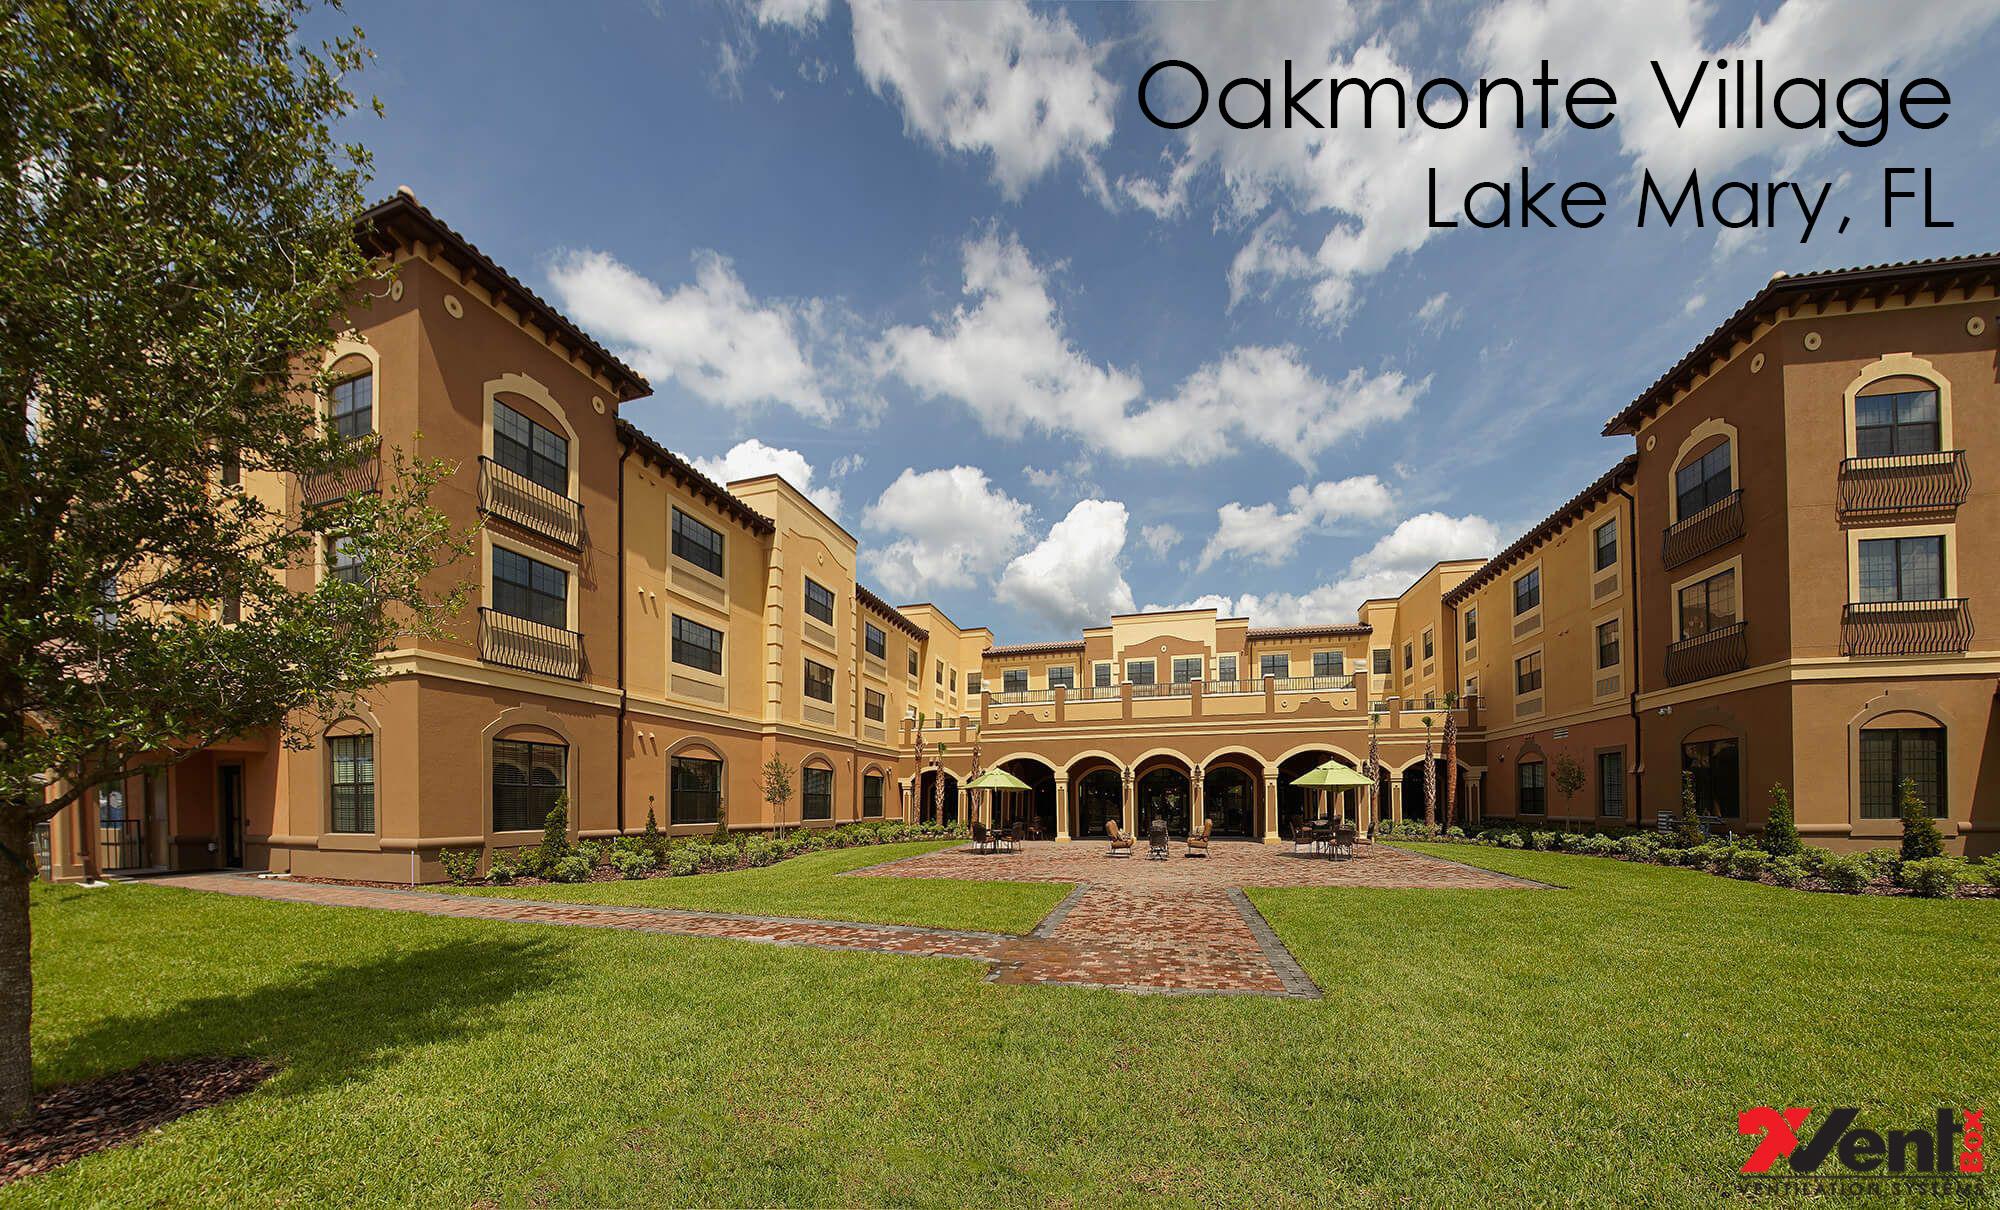 Oakmonte Village